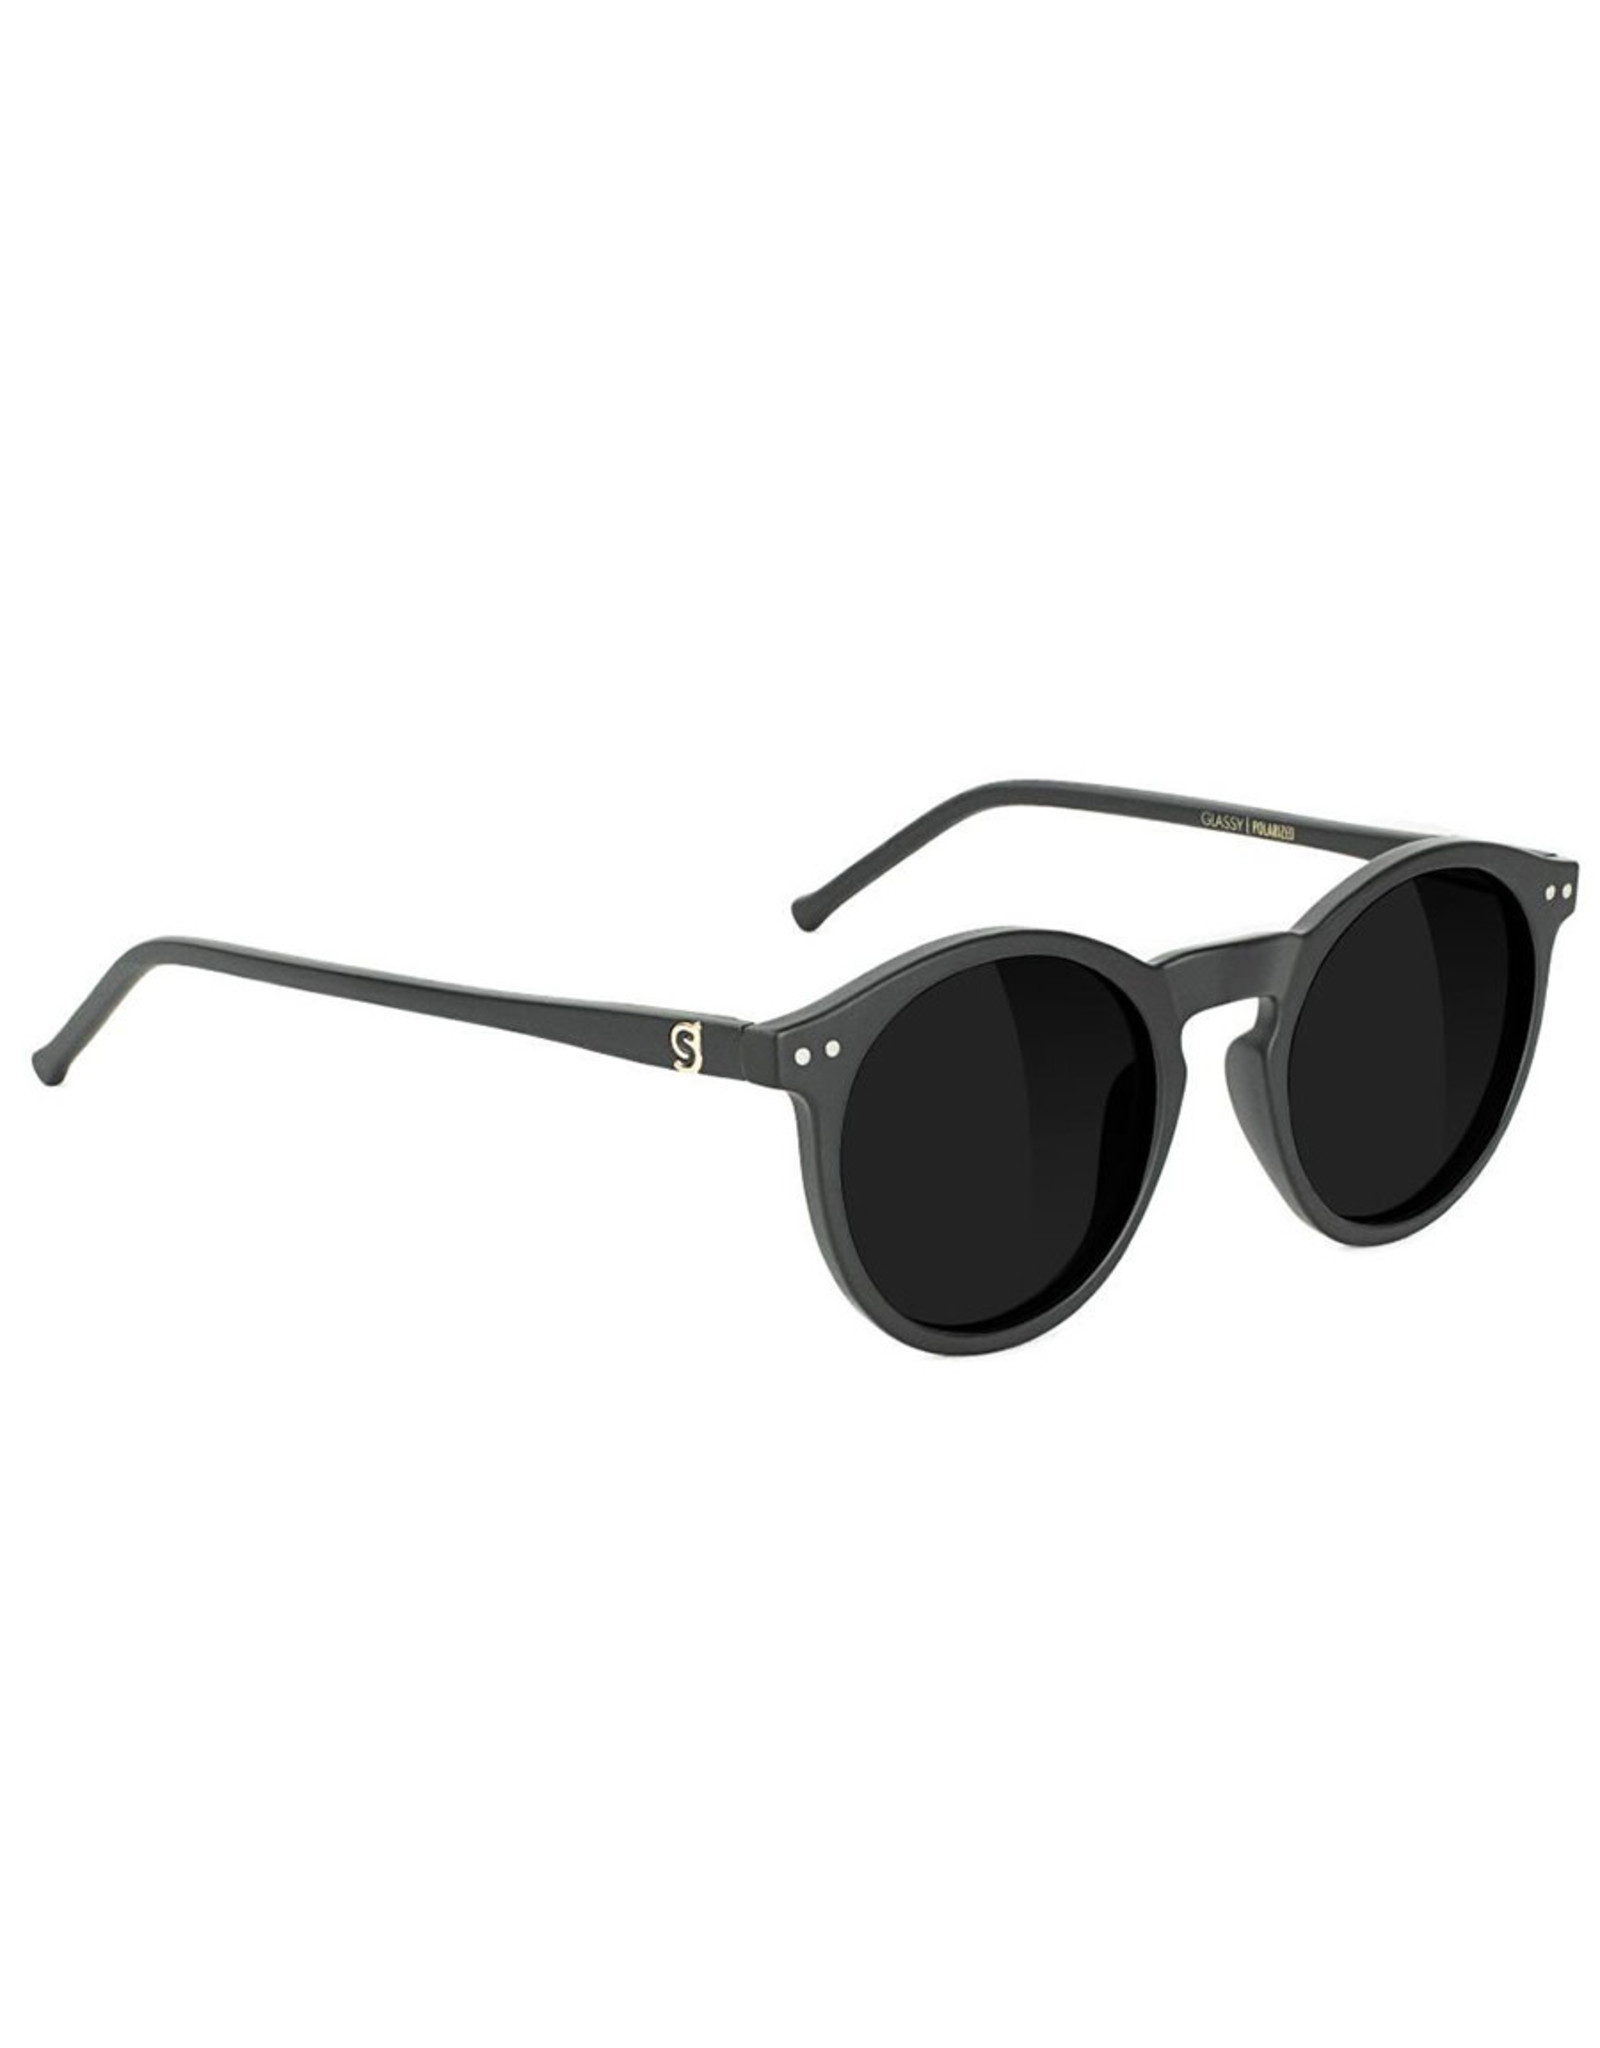 Glassy Sunglasses Glassy Sunglasses TimTim Premium (Black Matte/Grey Polarized Lens)